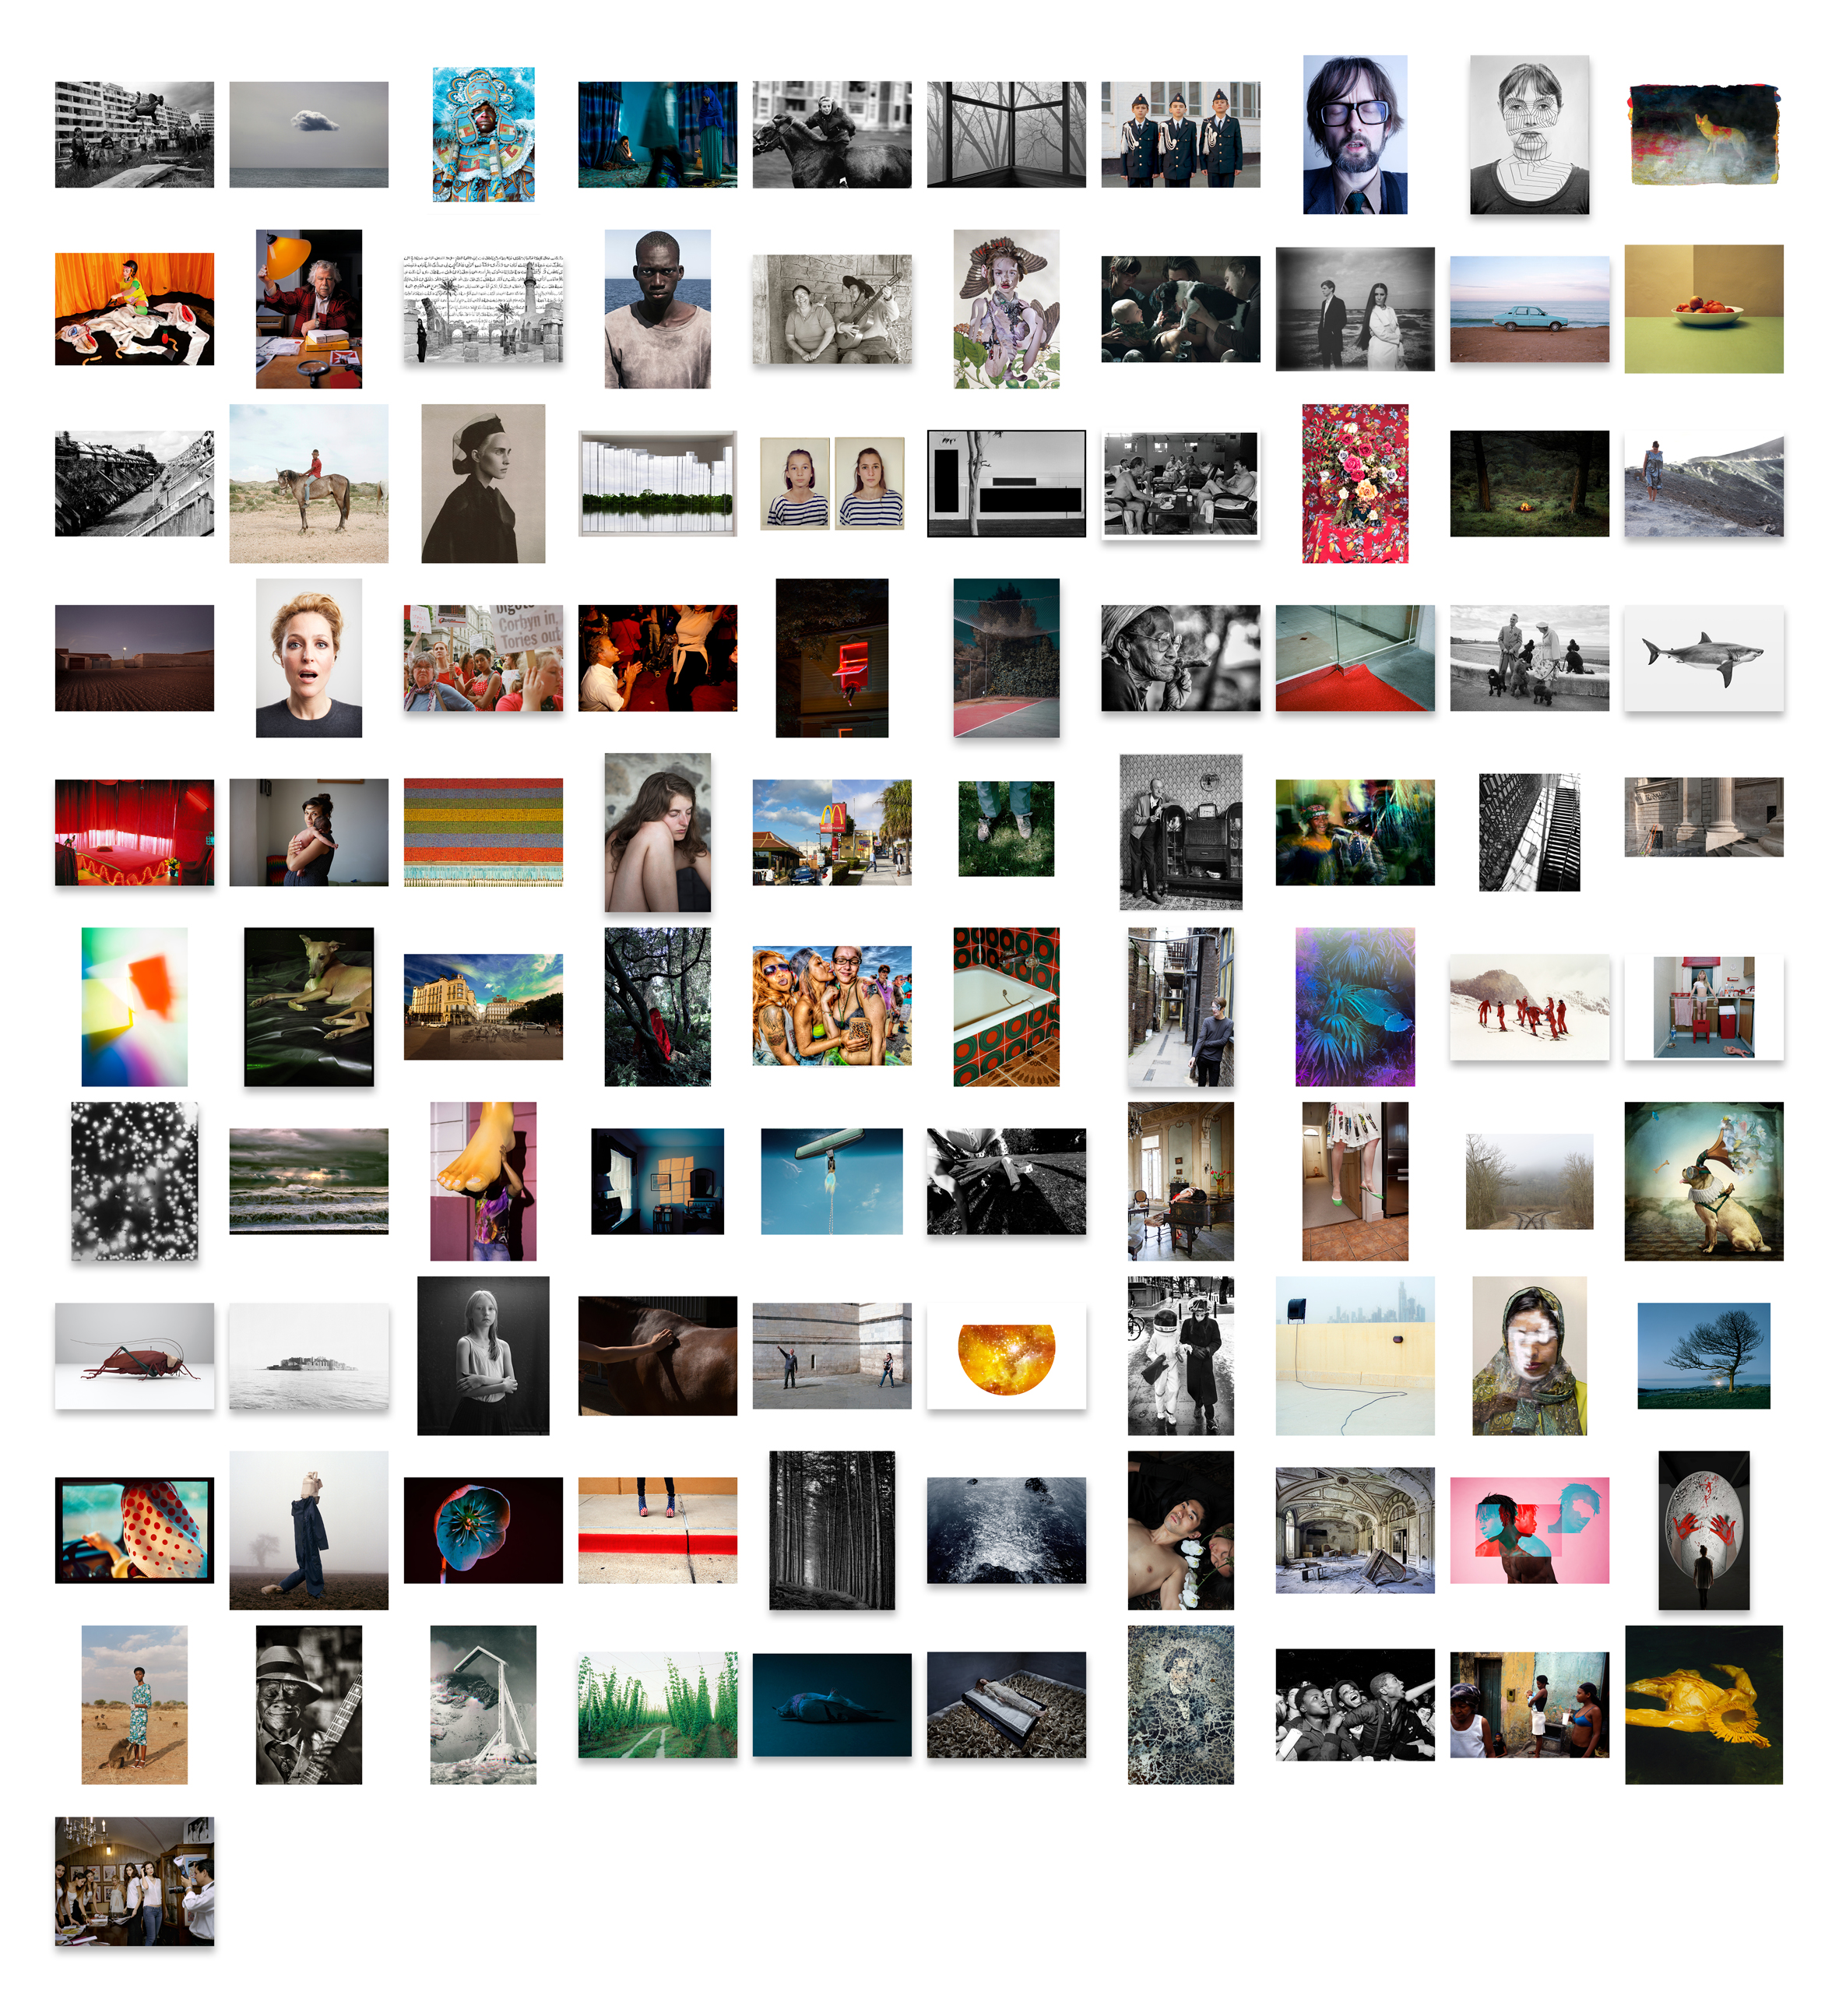 Resized - Contact Sheet of Postcards - 2018 POAP Boxset.jpg